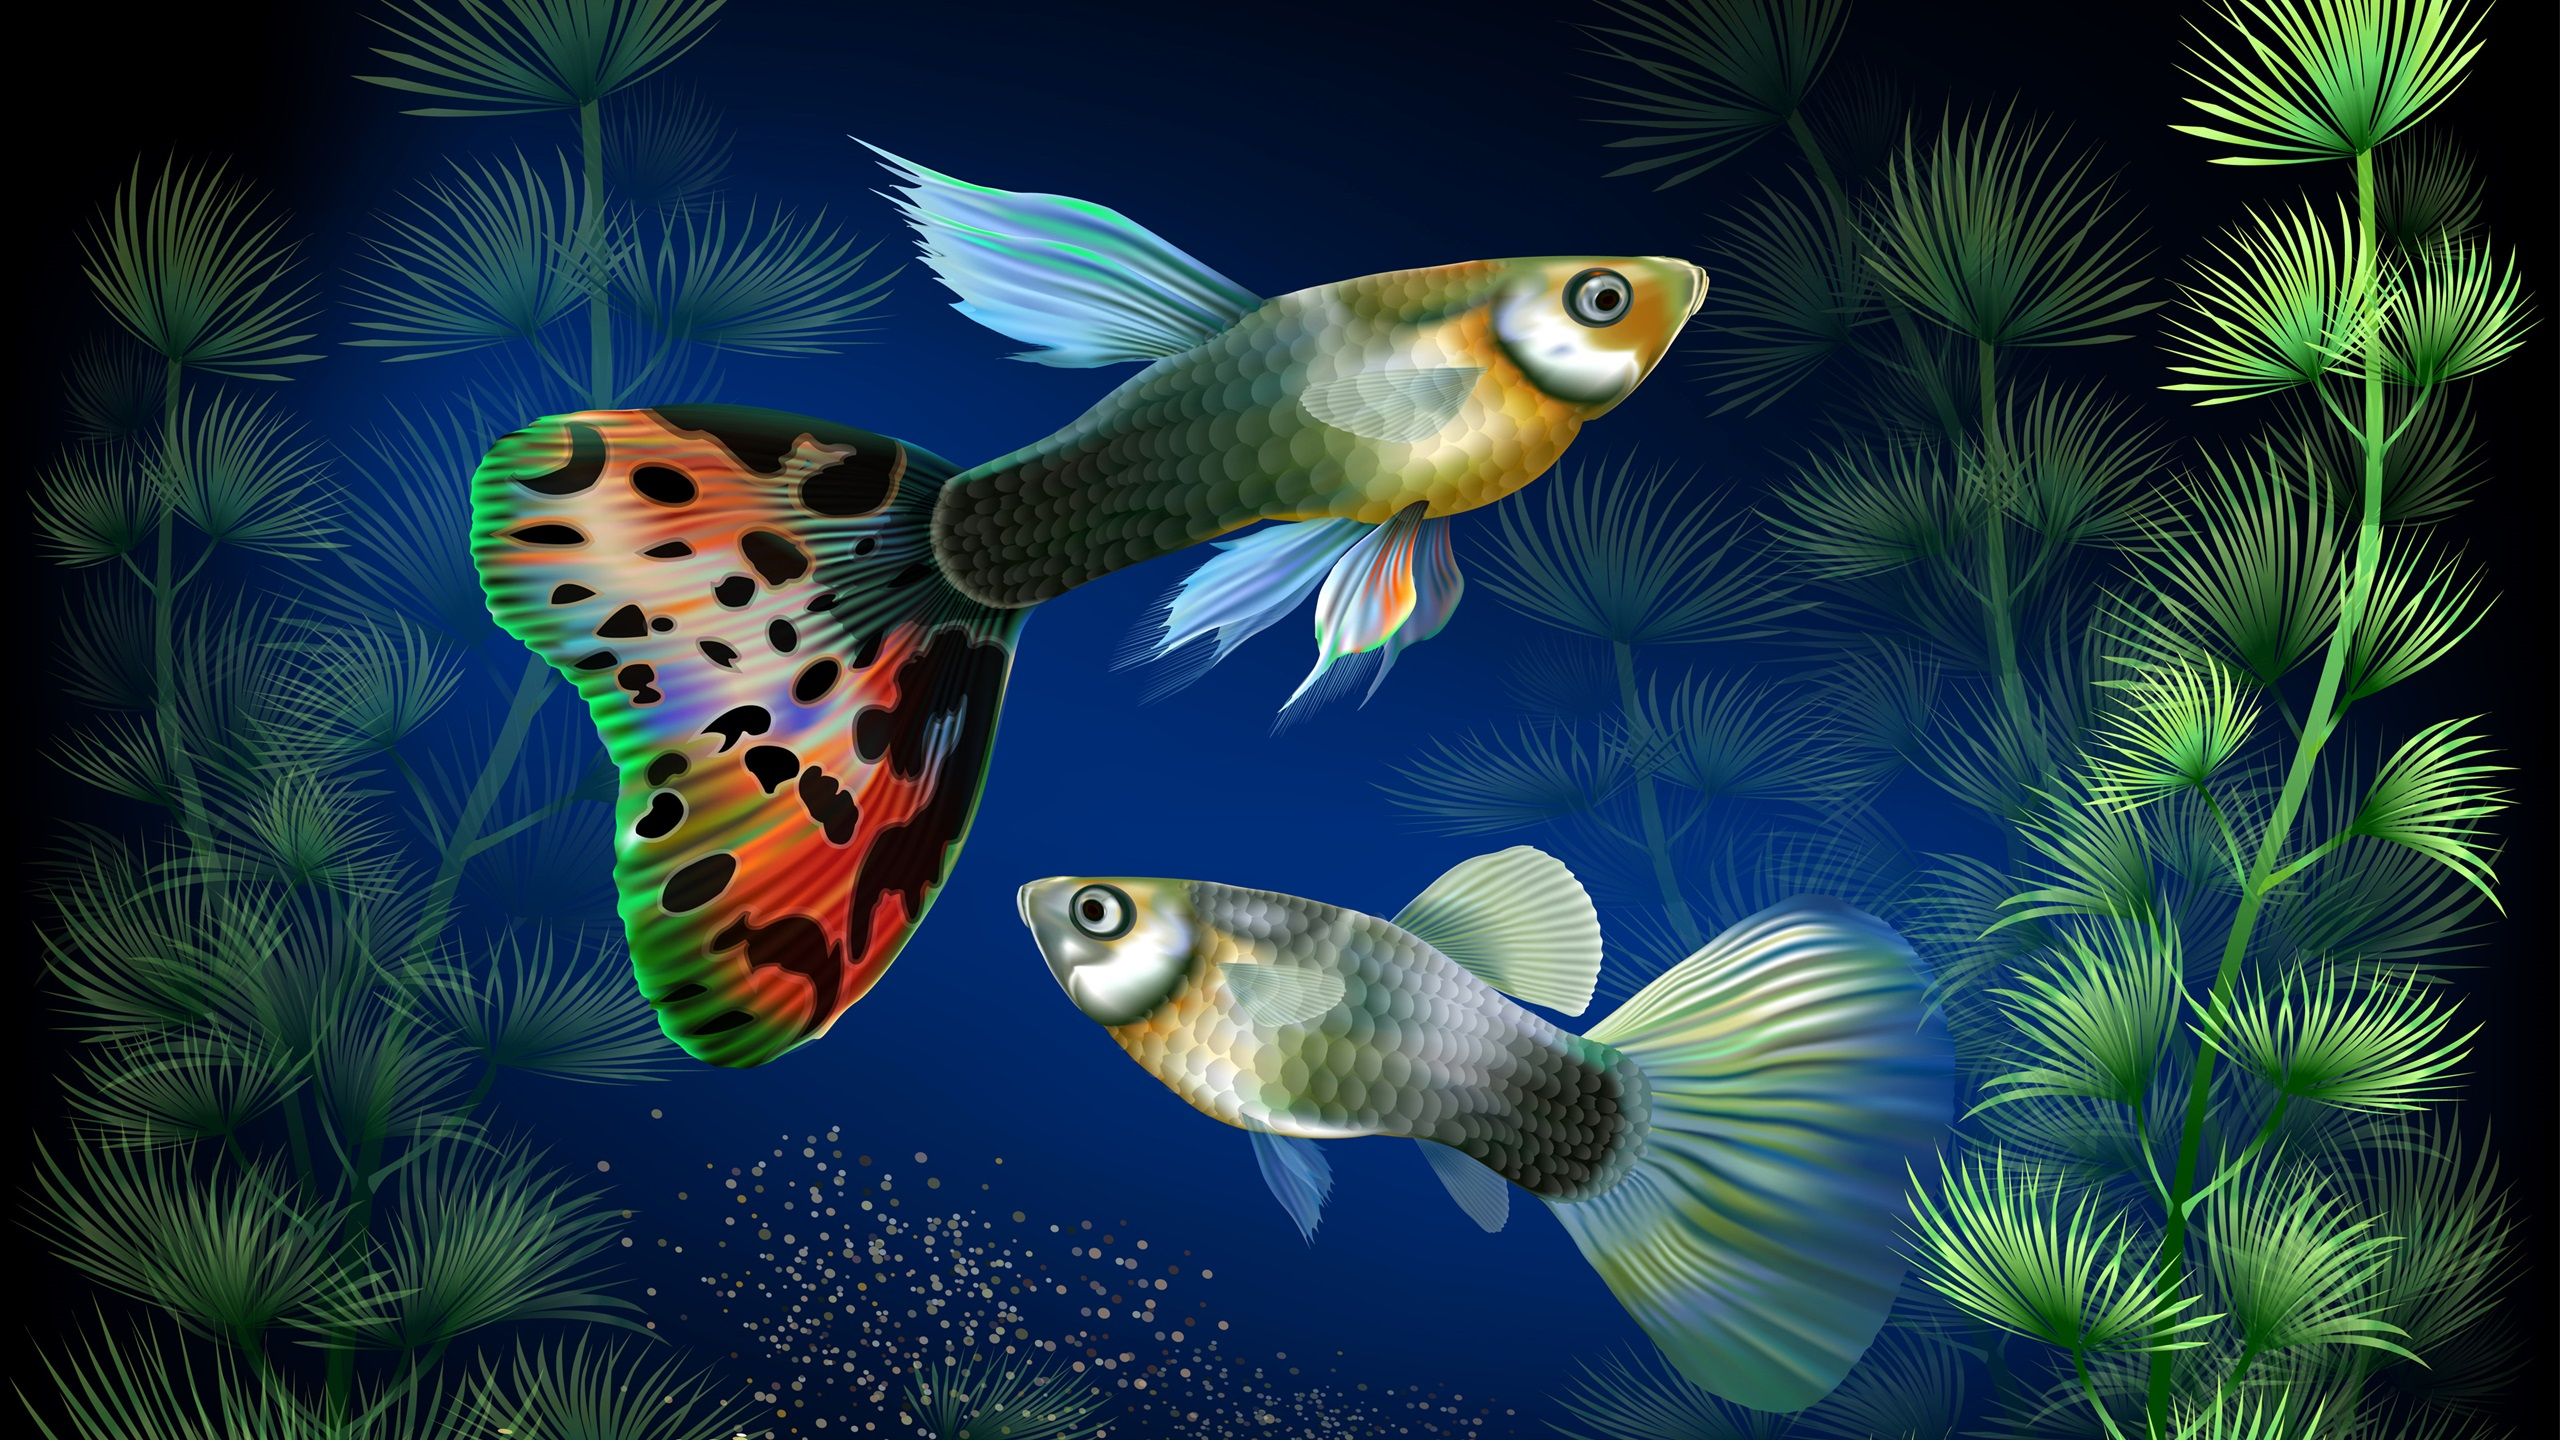 аквариумные рыбки картинки на телефон отмечает